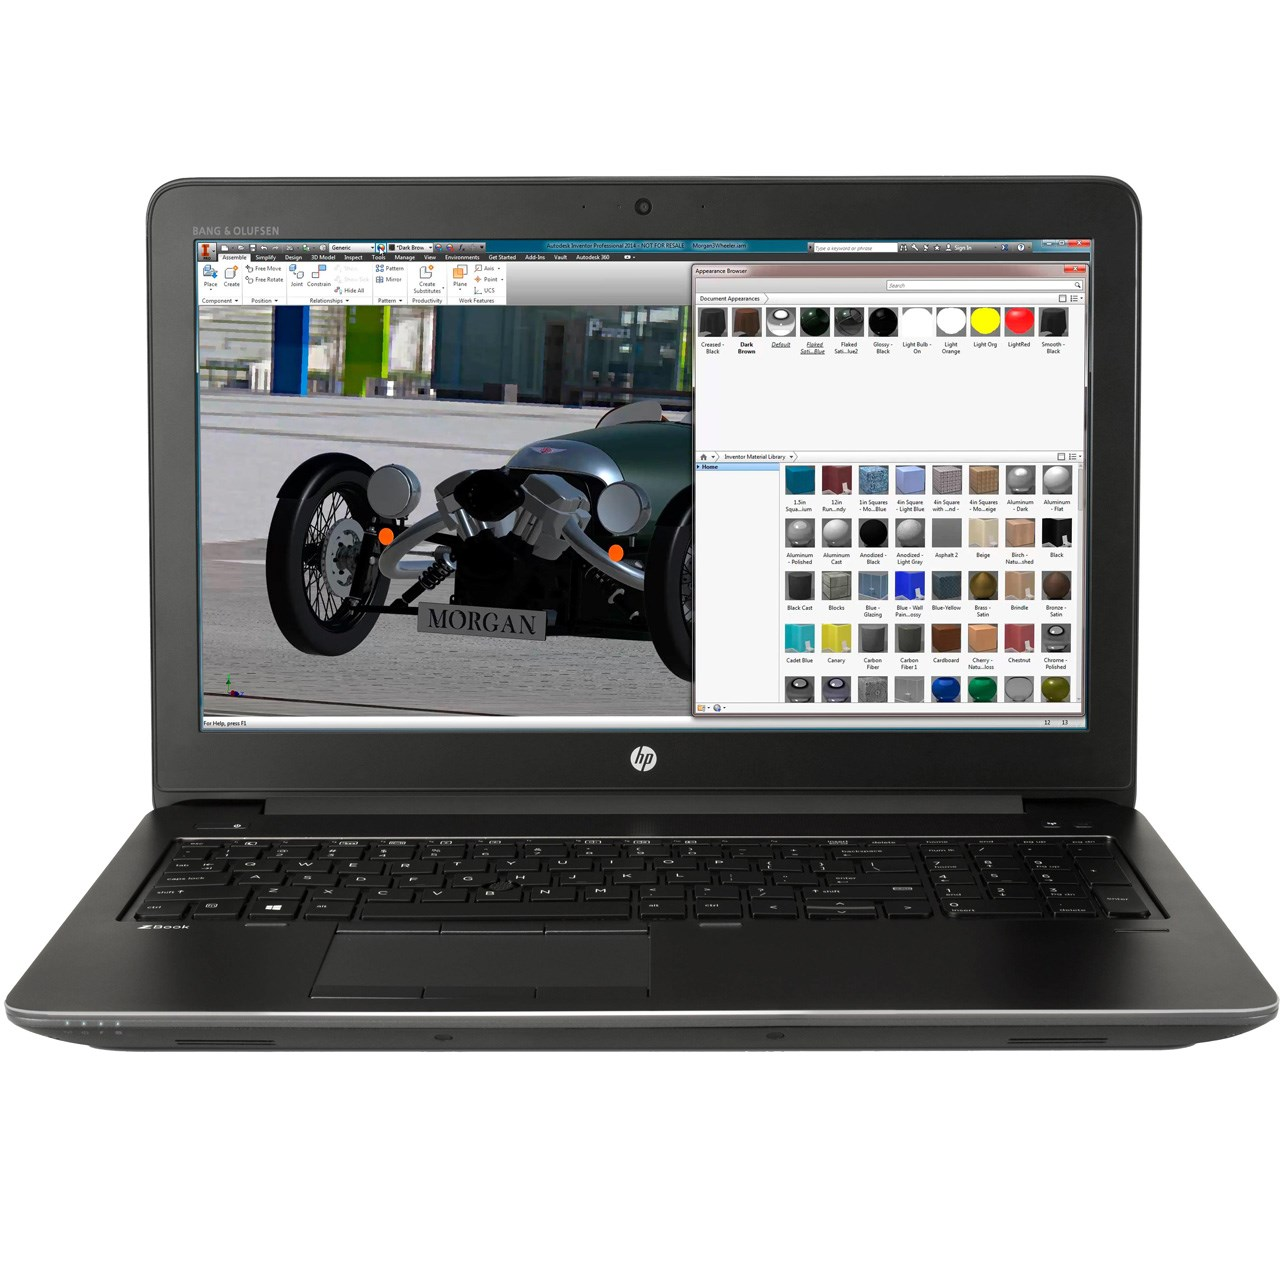 لپ تاپ 15 اینچی اچ پی مدل ZBook 15 G3 Mobile Workstation - B